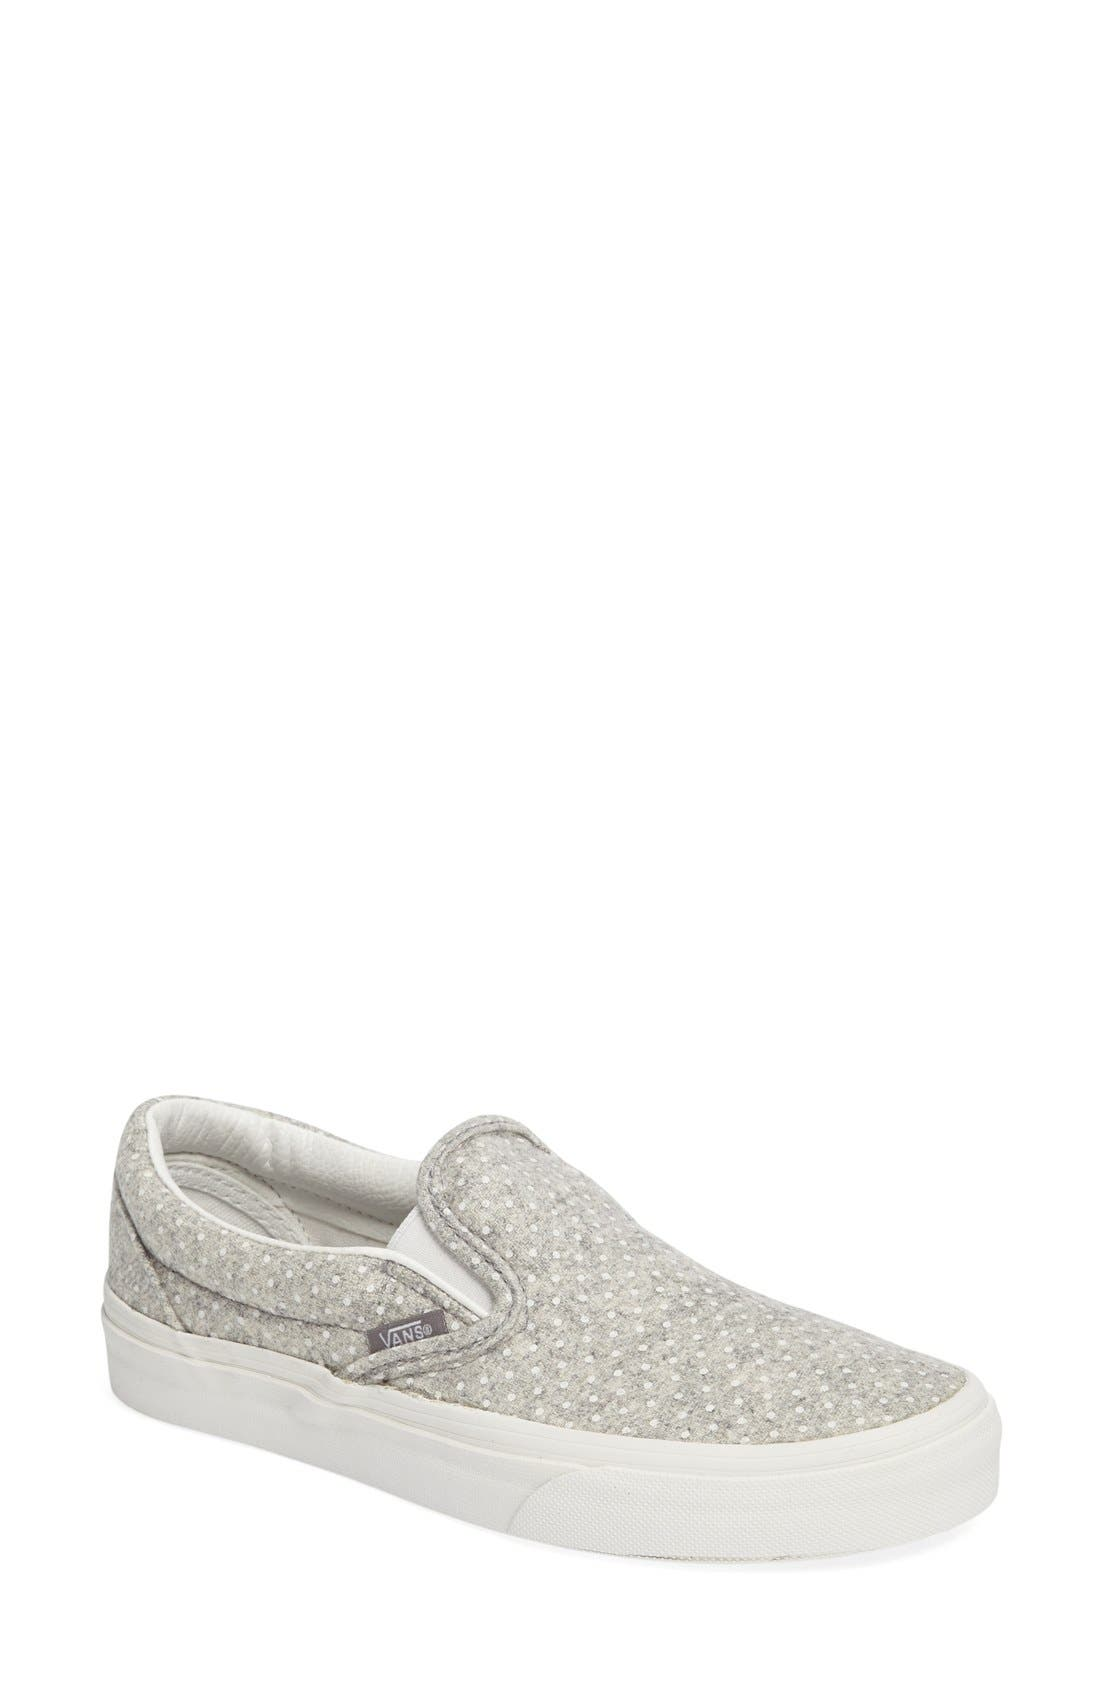 ,                             Classic Slip-On Sneaker,                             Main thumbnail 253, color,                             020